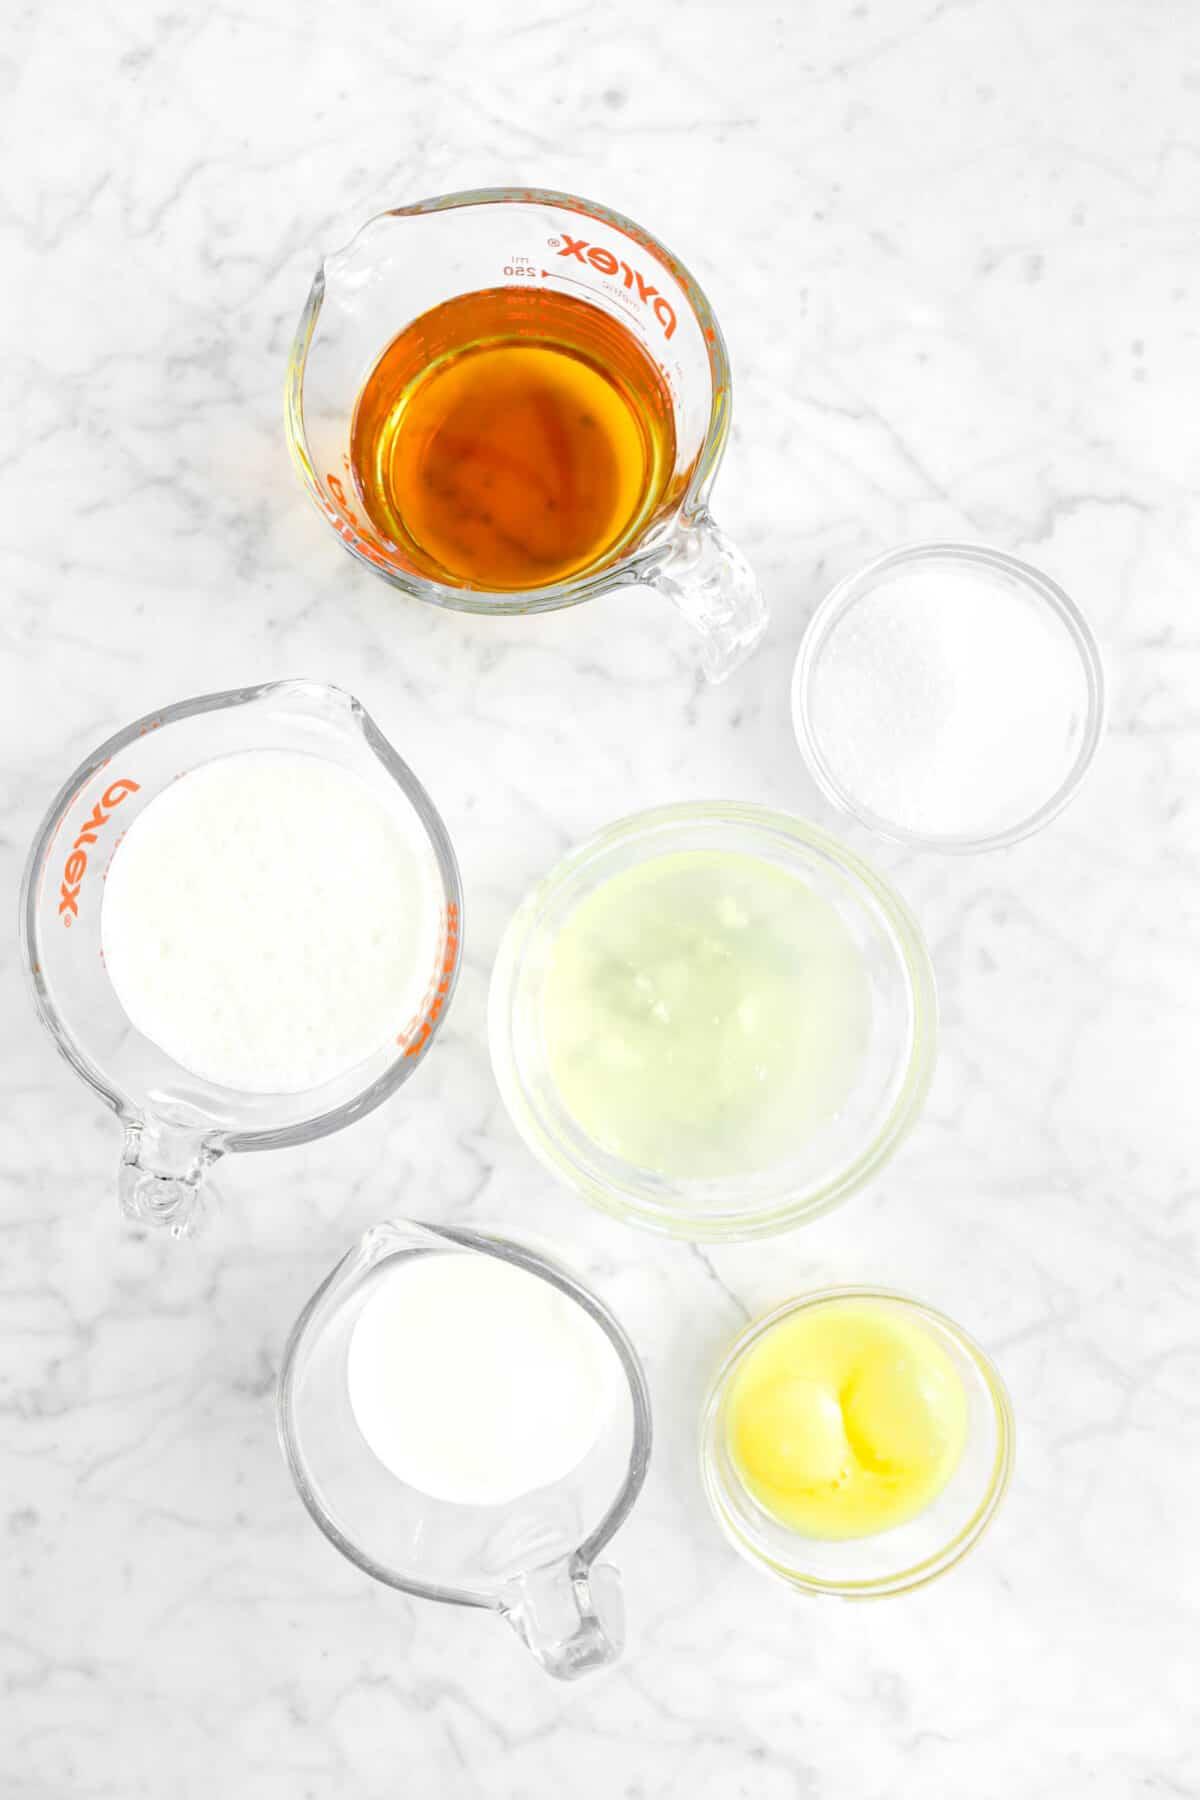 bourbon, sugar, heavy cream, egg whites, egg yolks, and whole milk on marble counter